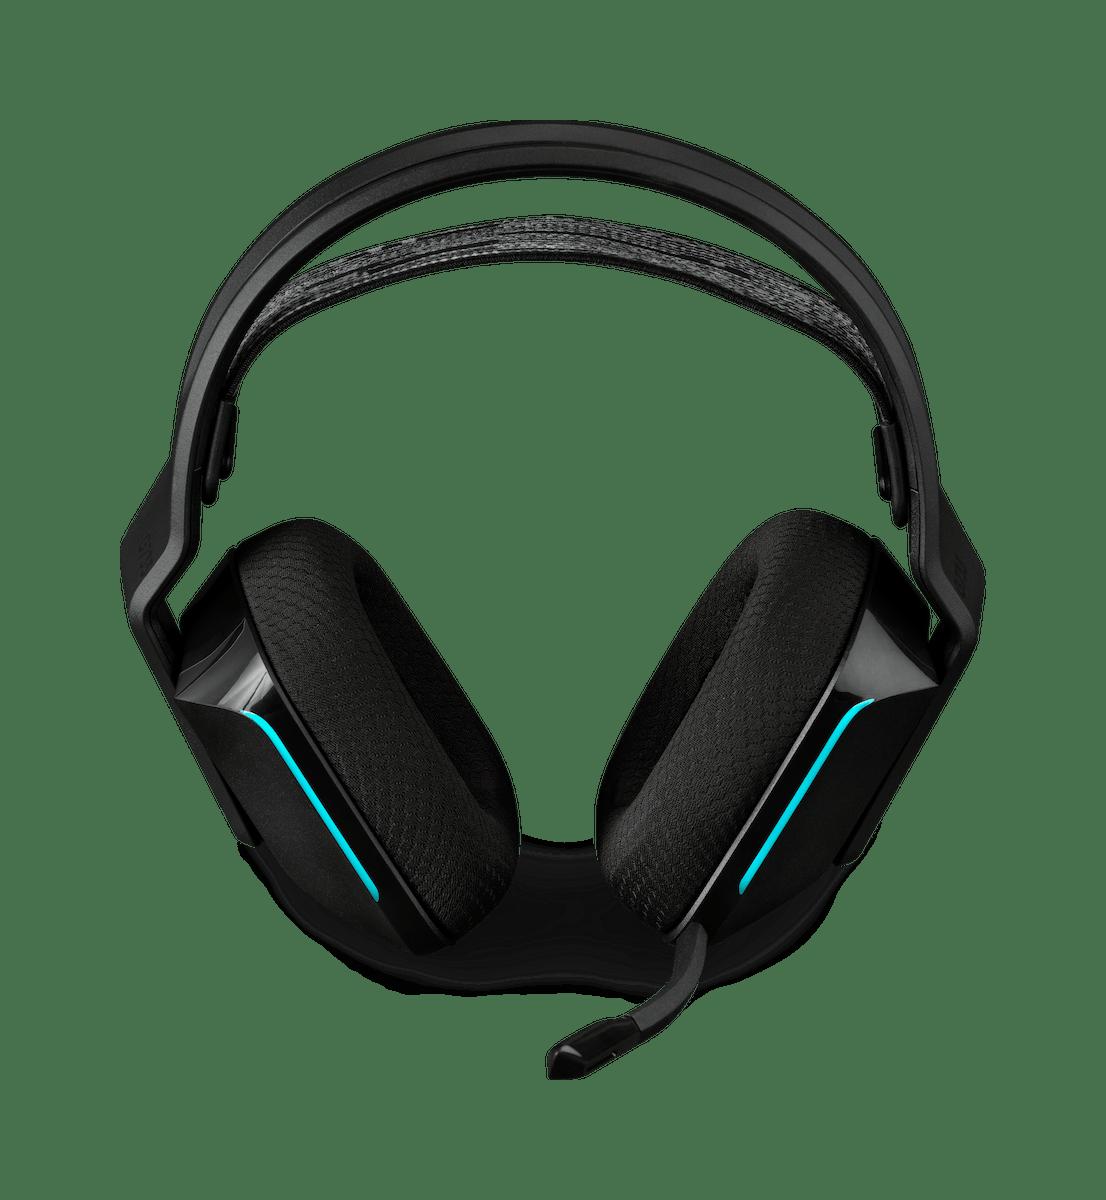 Logitech G G733 LIGHTSPEED Wireless RGB Gaming Headset